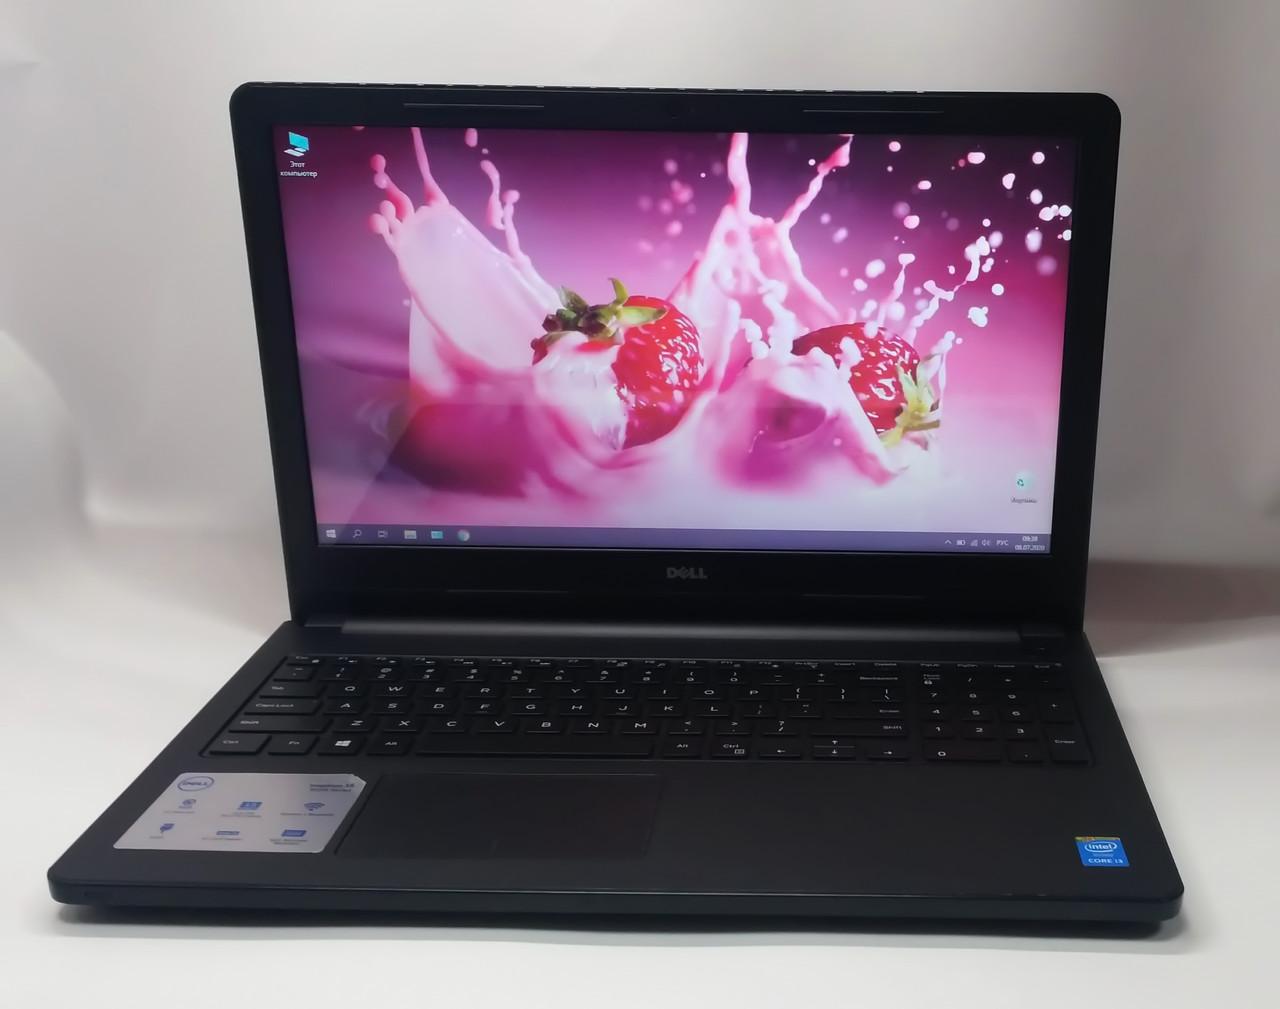 "Ноутбук Dell Inspirion 3558 15.6"" Intel Core i3 2.0 GHz 4 GB RAM 500 GB HDD Black Б/У"